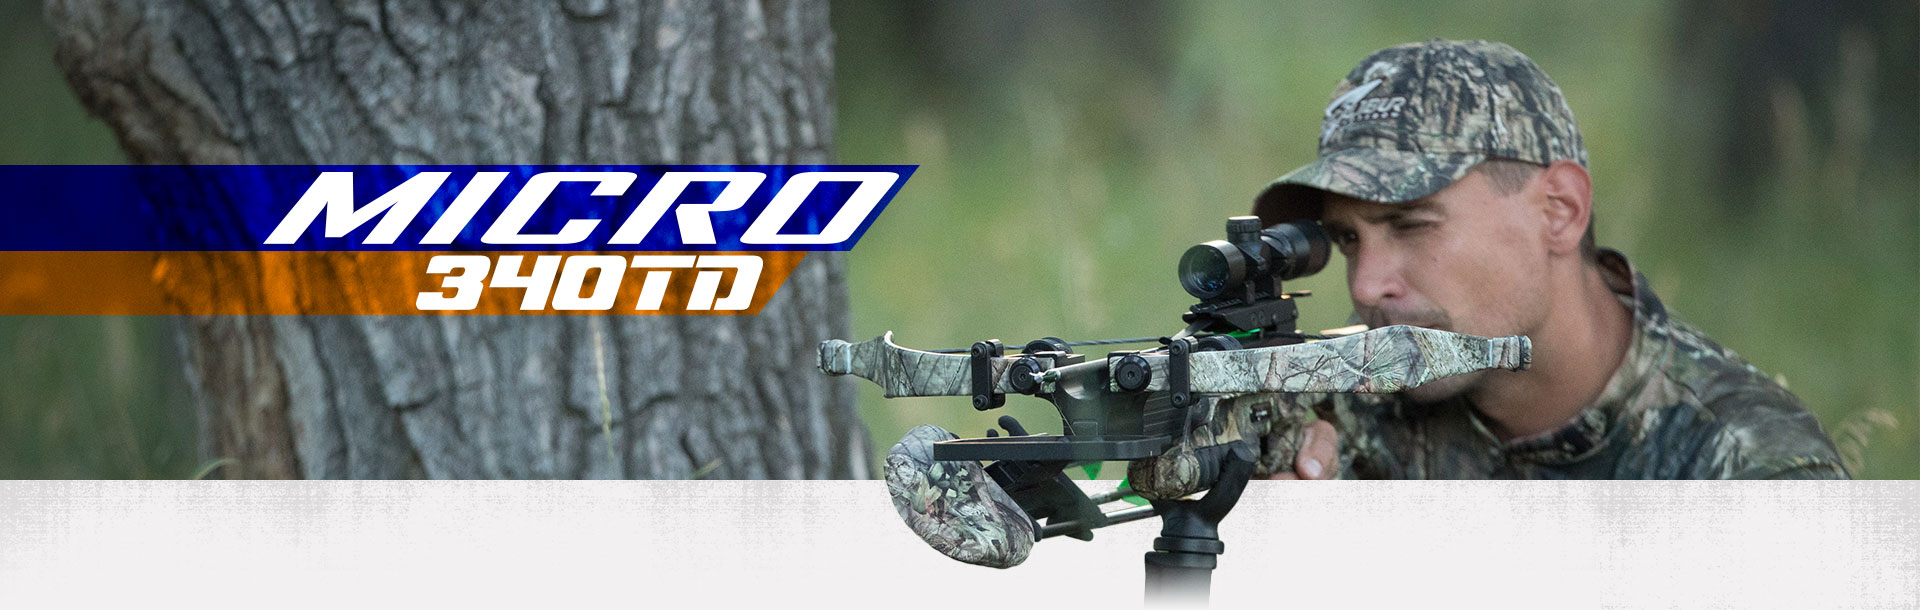 Excalibur Micro 340TD crossbow in camo